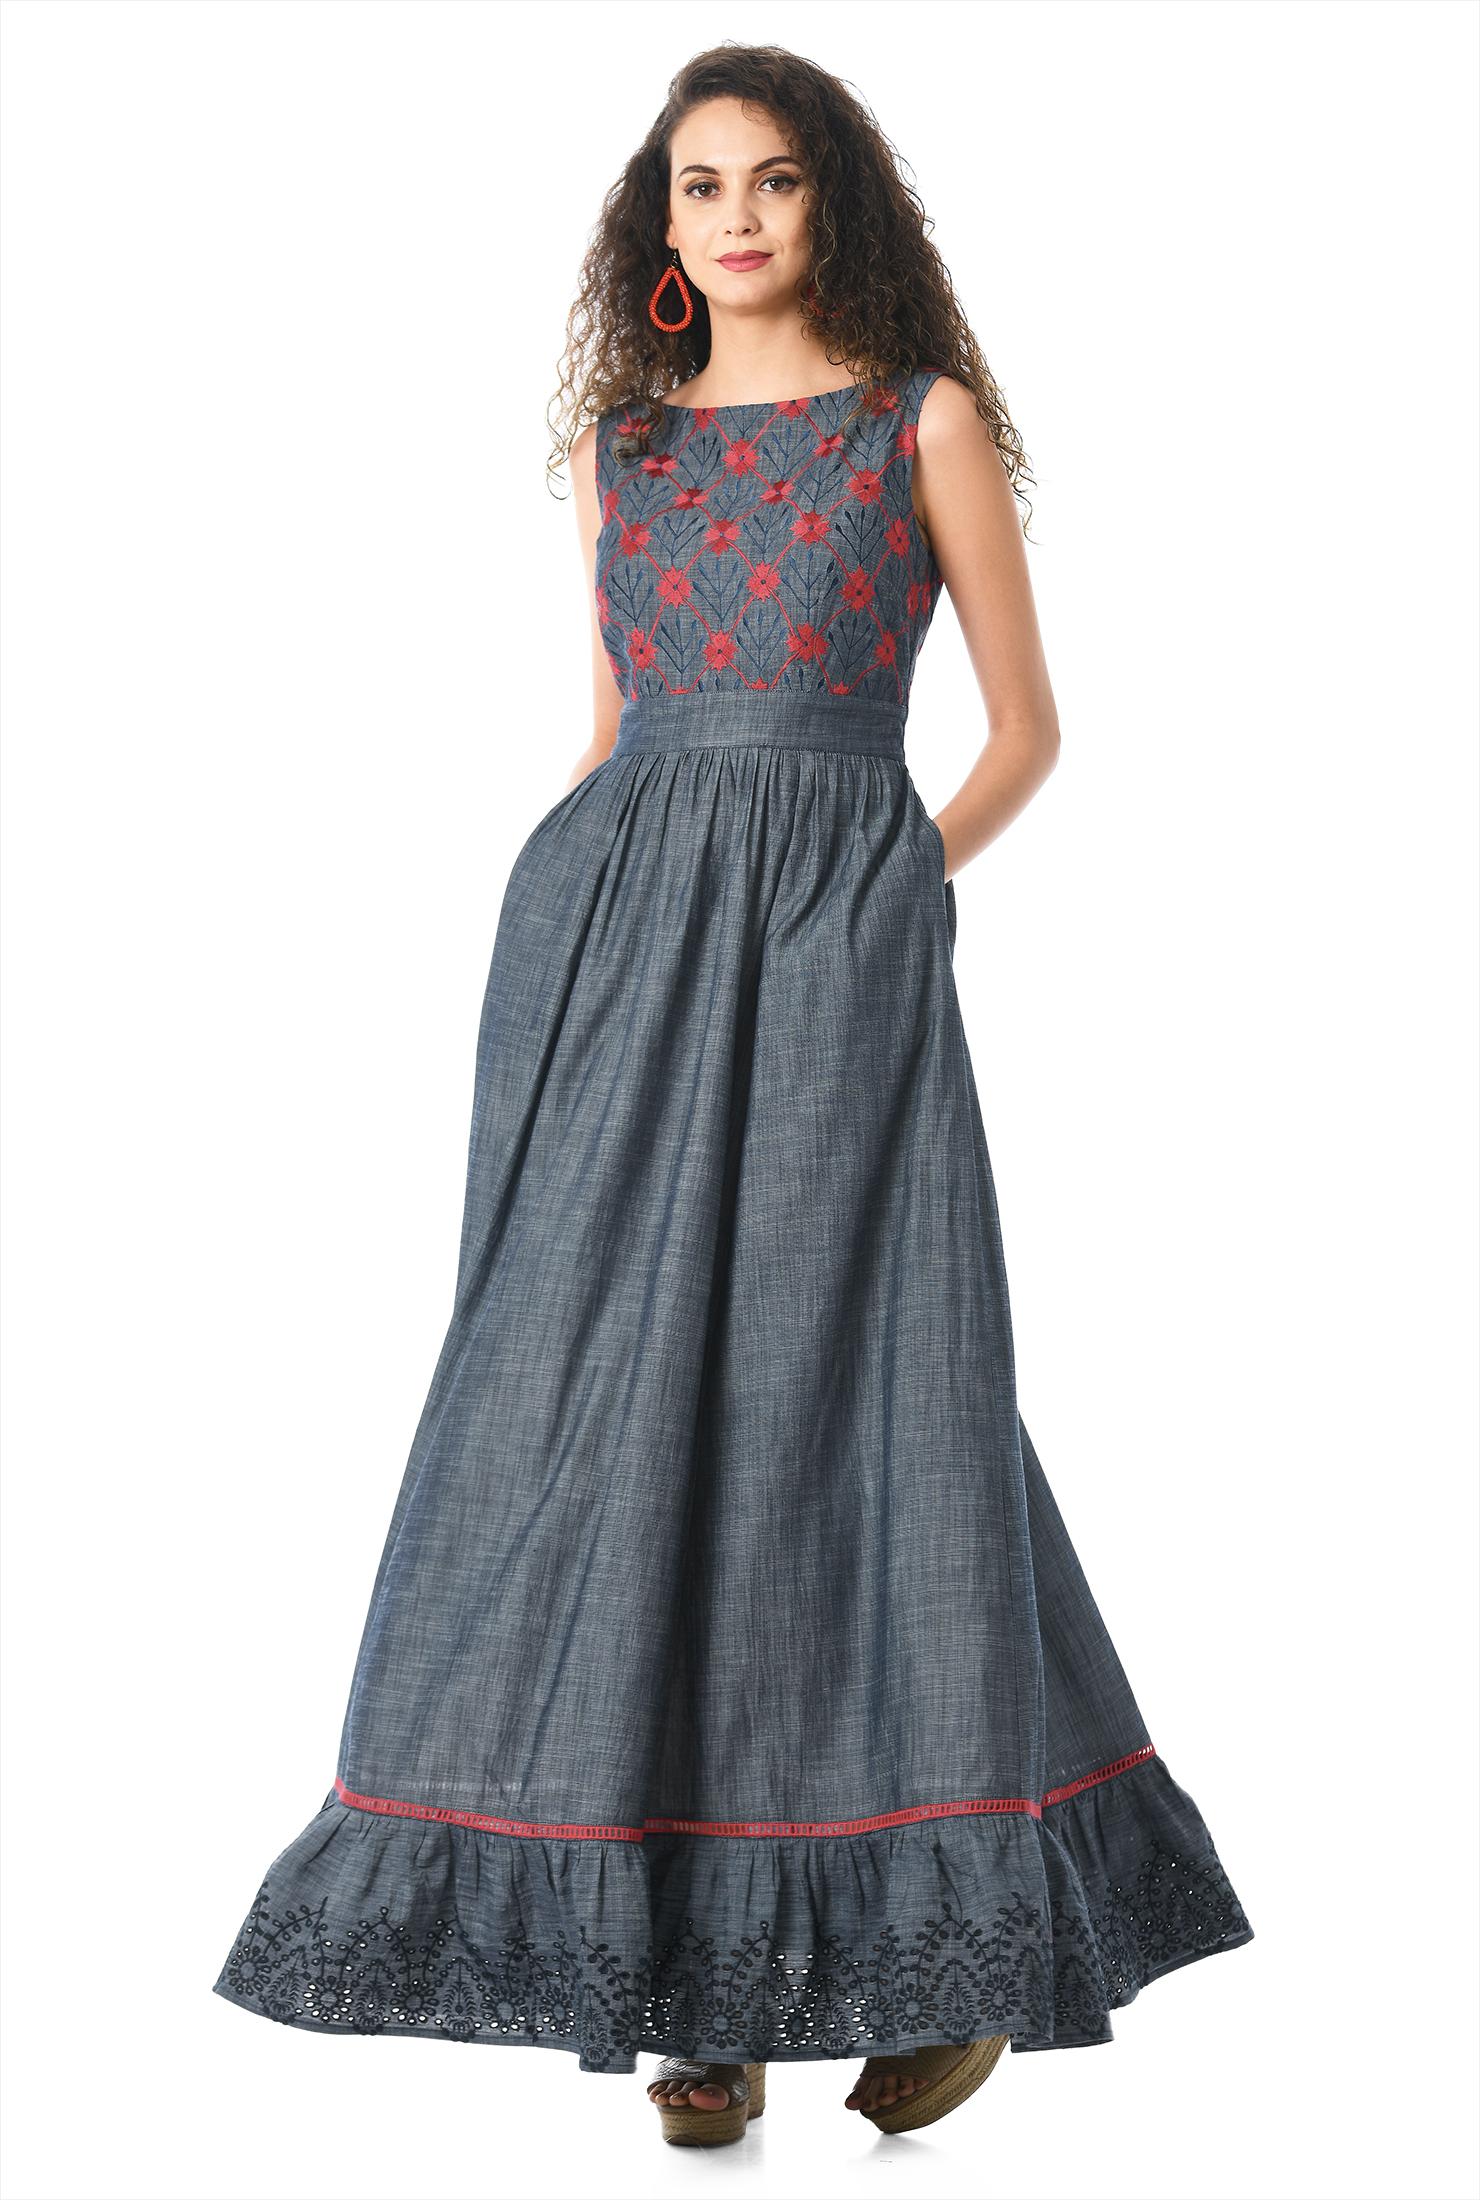 3514172fed5 Women s Fashion Clothing 0-36W and Custom